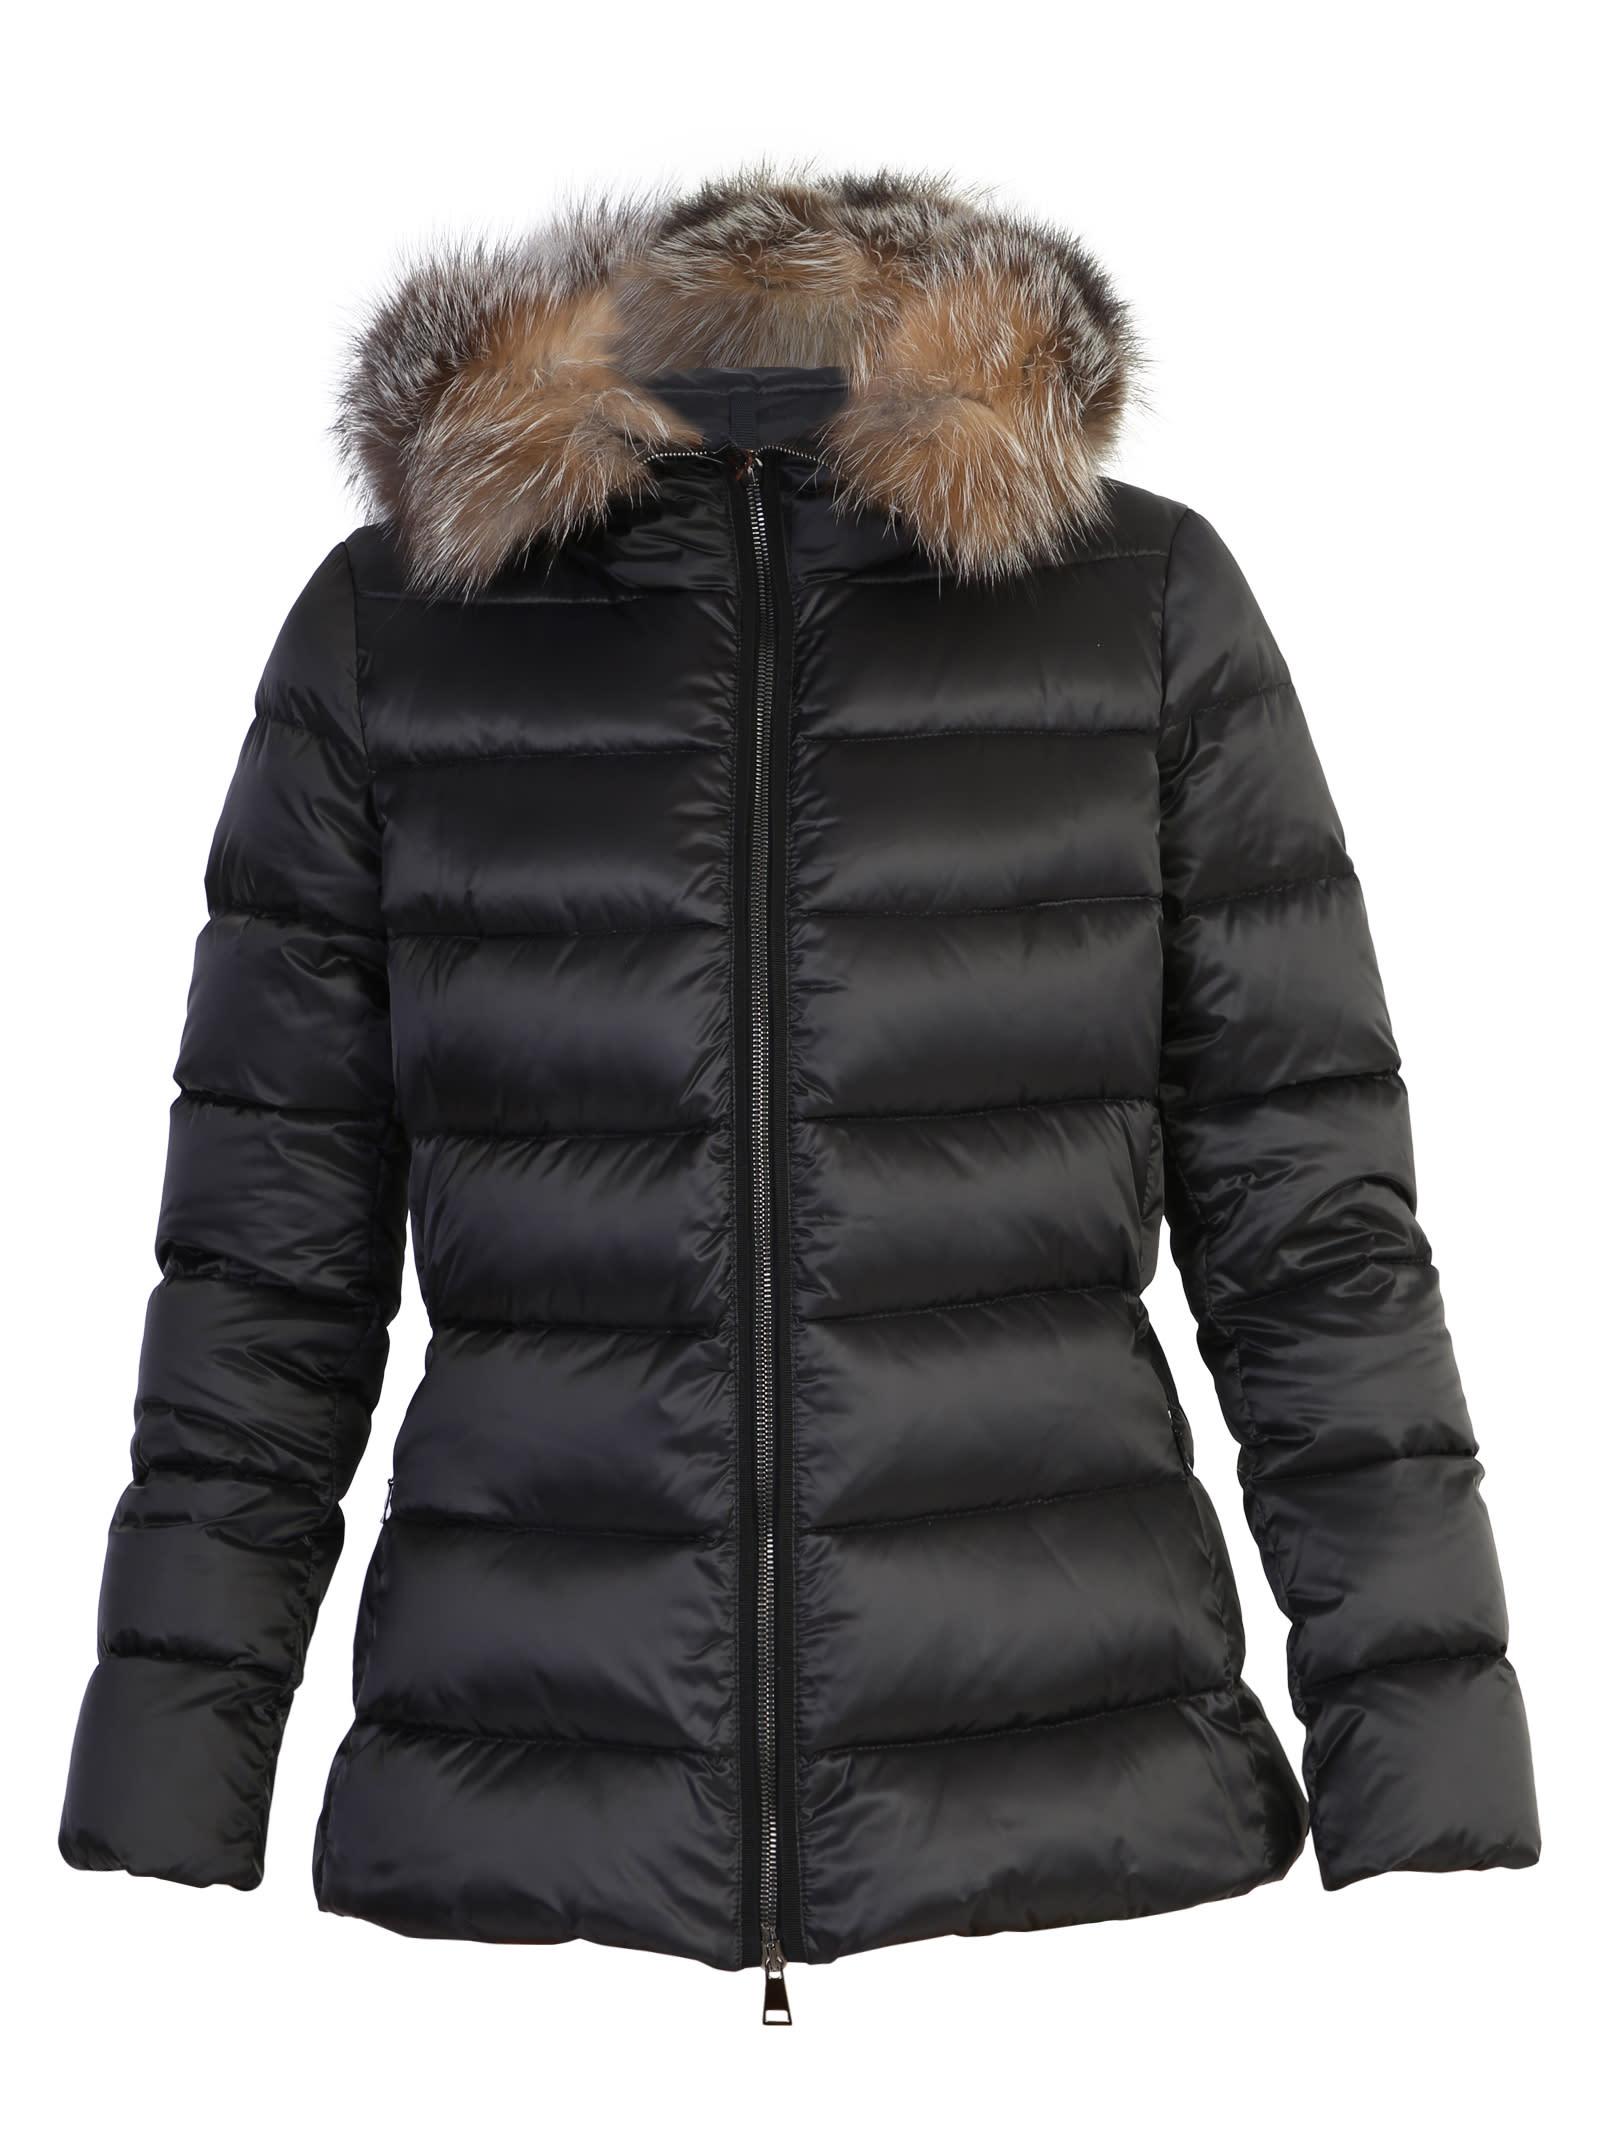 Moncler Tati Padded Jacket